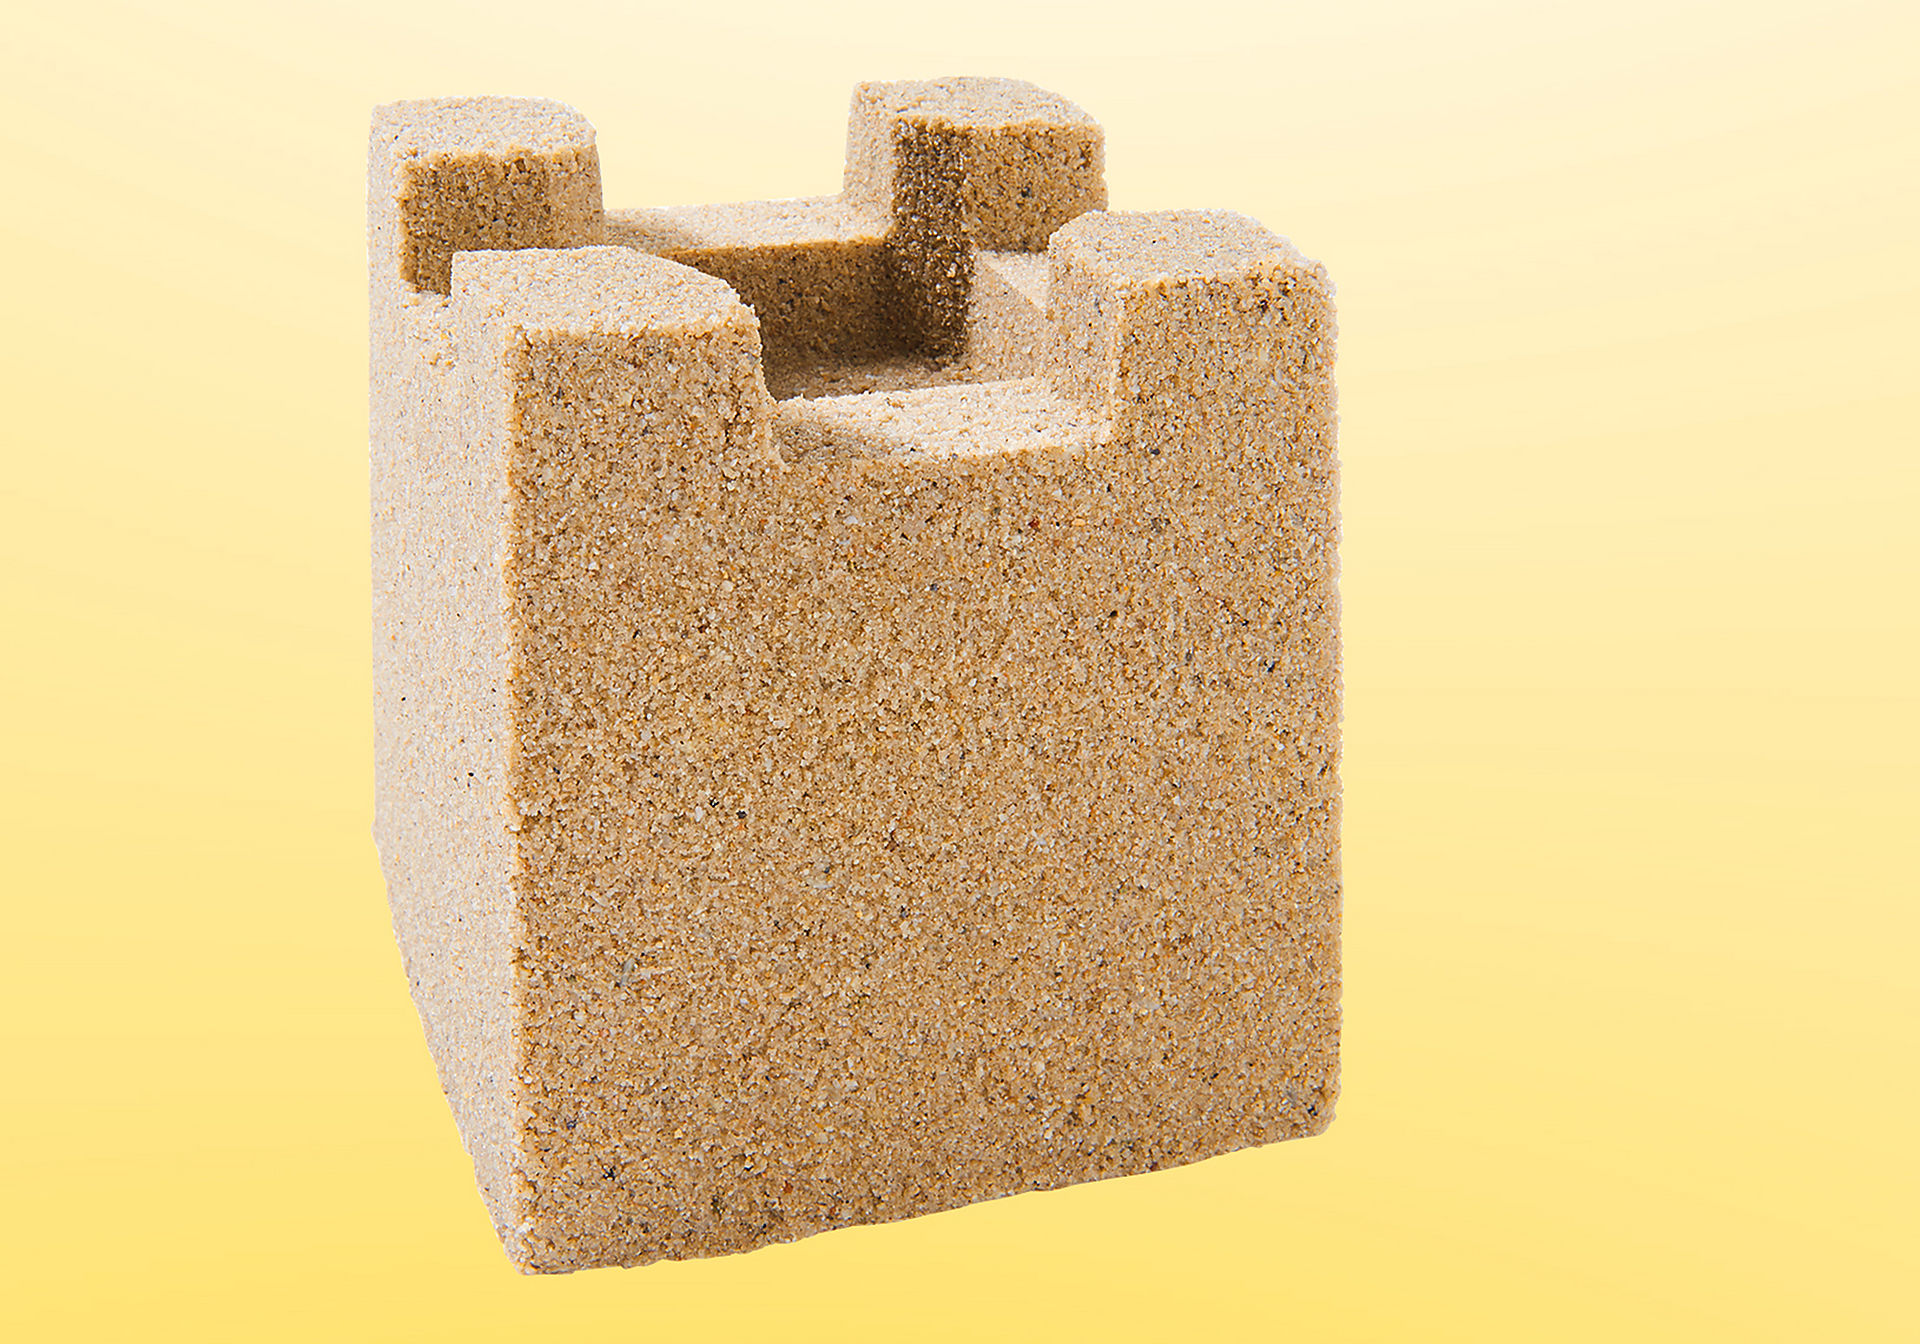 70340 Knight's Castle Sand Bucket zoom image6